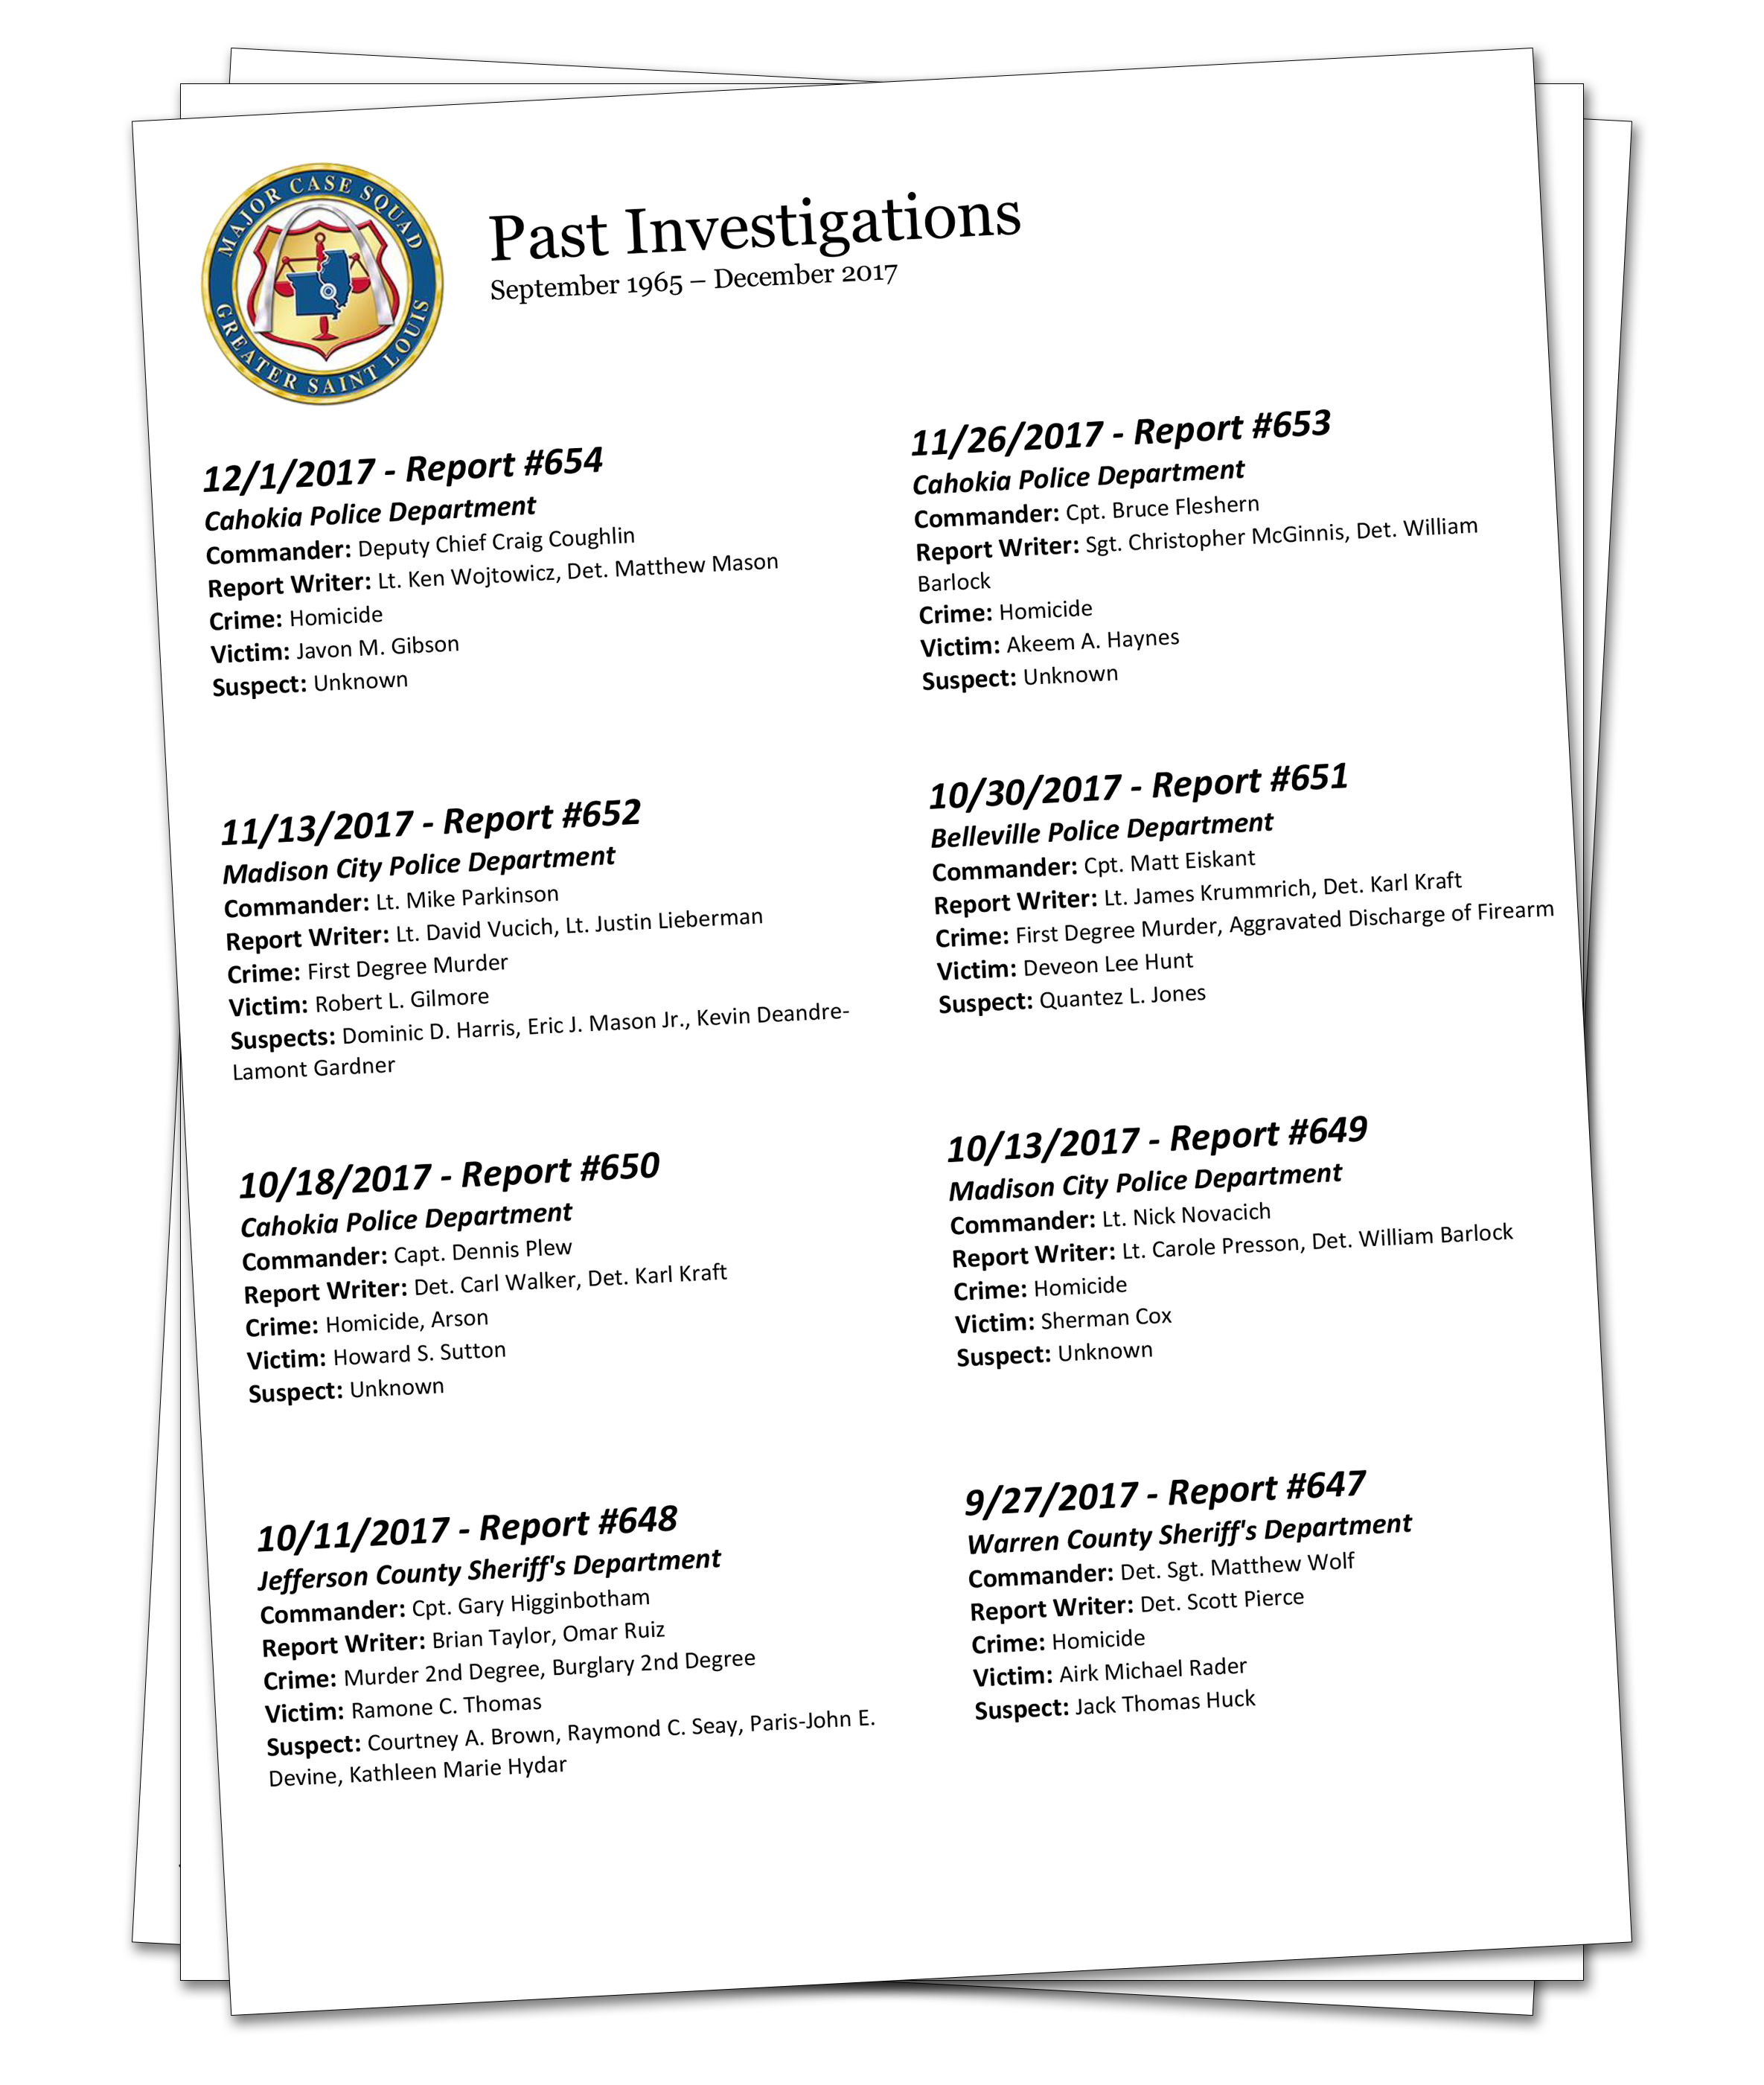 mcs-past-investigations.png